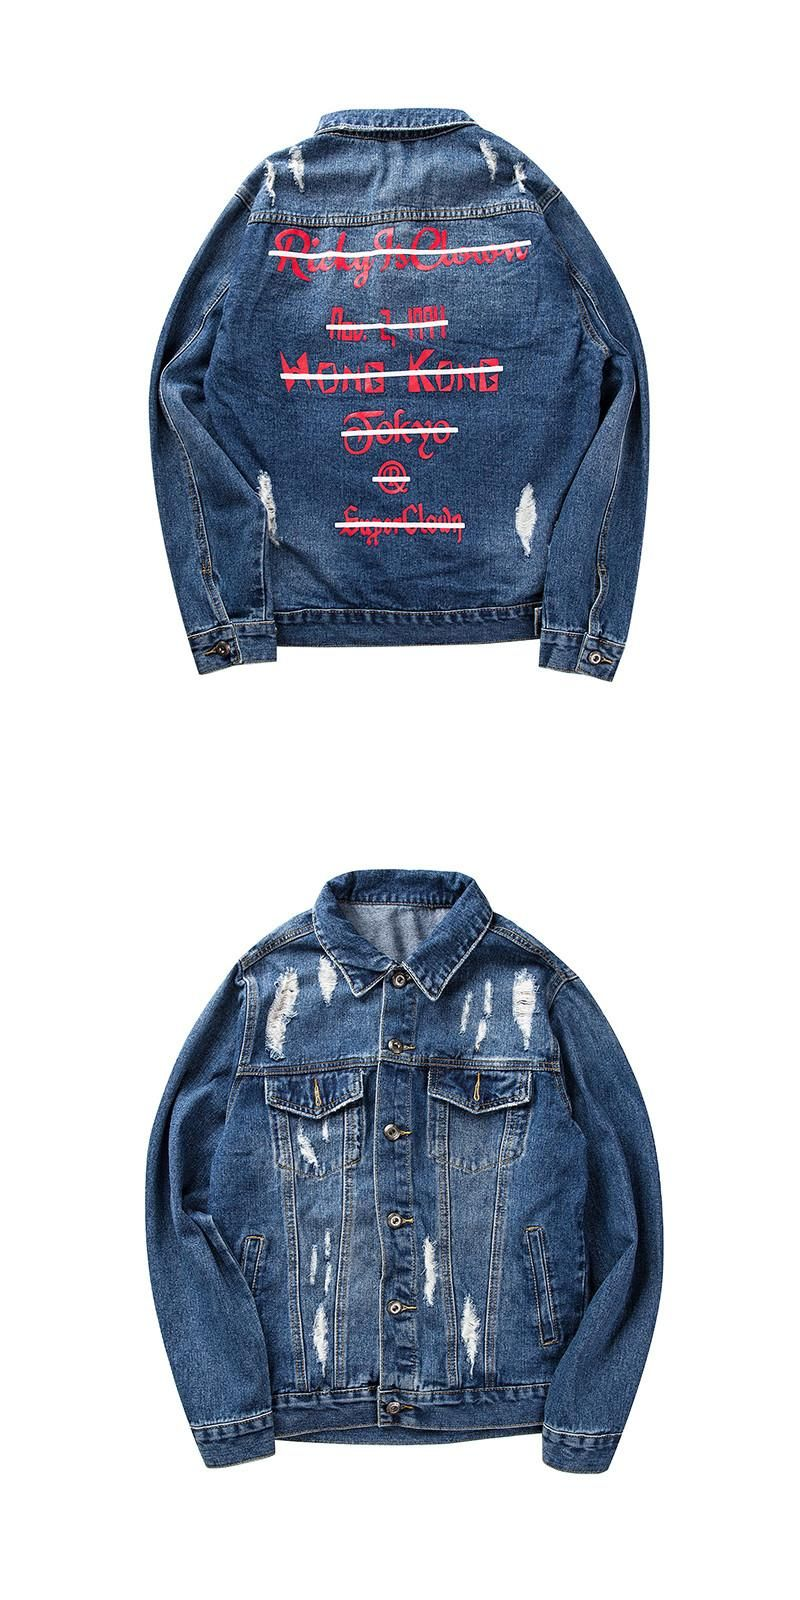 d683b72f3d5 Graffiti Letter Men Ripped Denim Jackets Mens 2017 Printed Jeans Women Coat  Hip Hop Casual Cotton